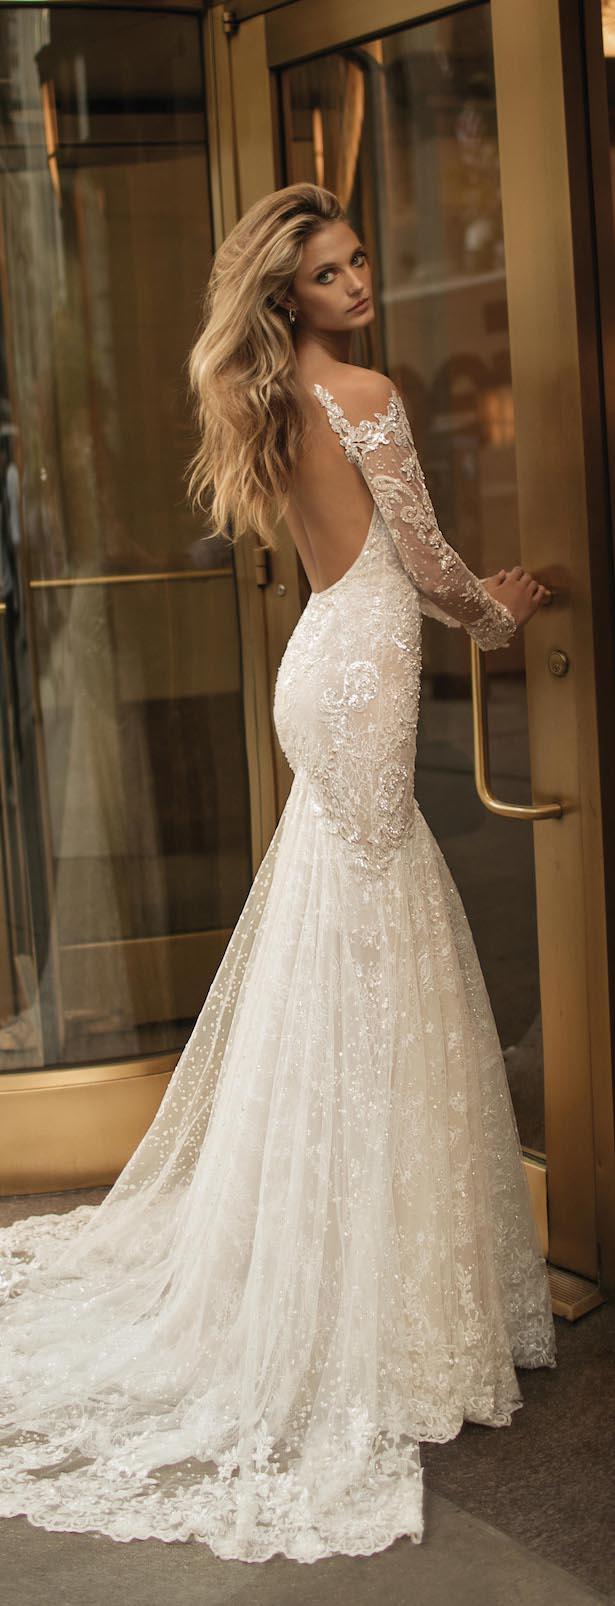 wedding dresses 2017 fall photo - 1